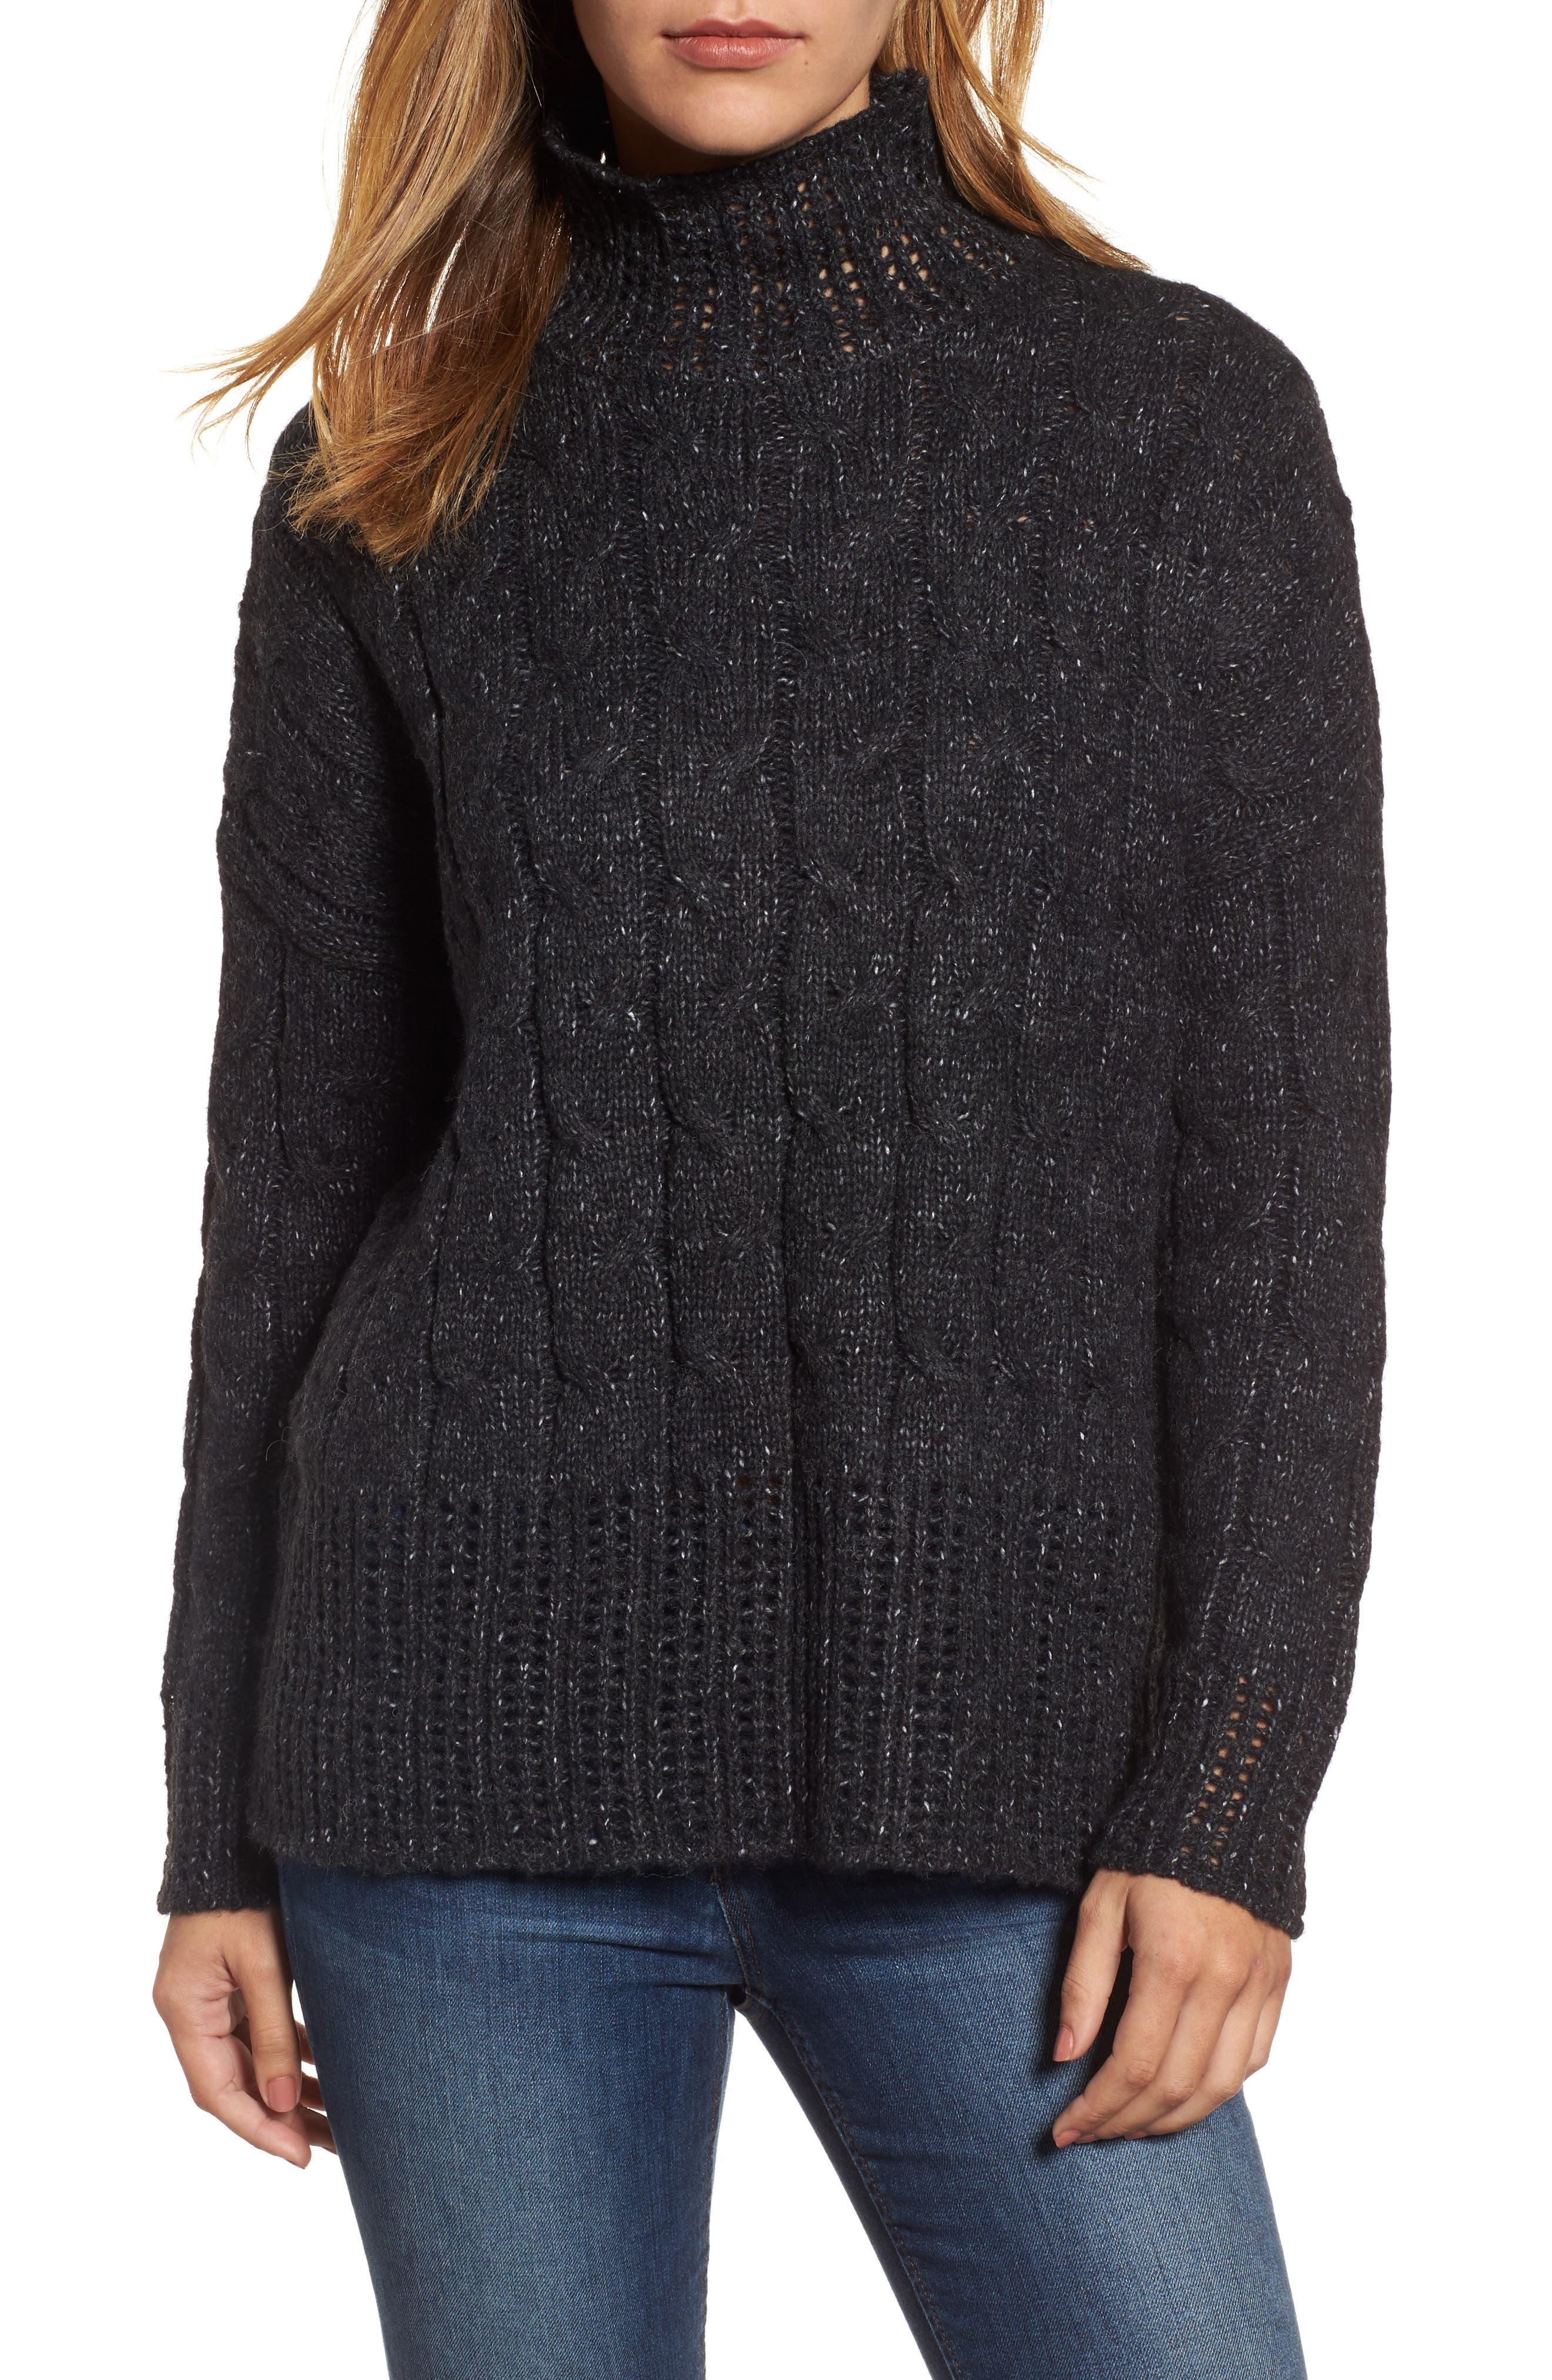 Press Pointelle Turtleneck Sweater